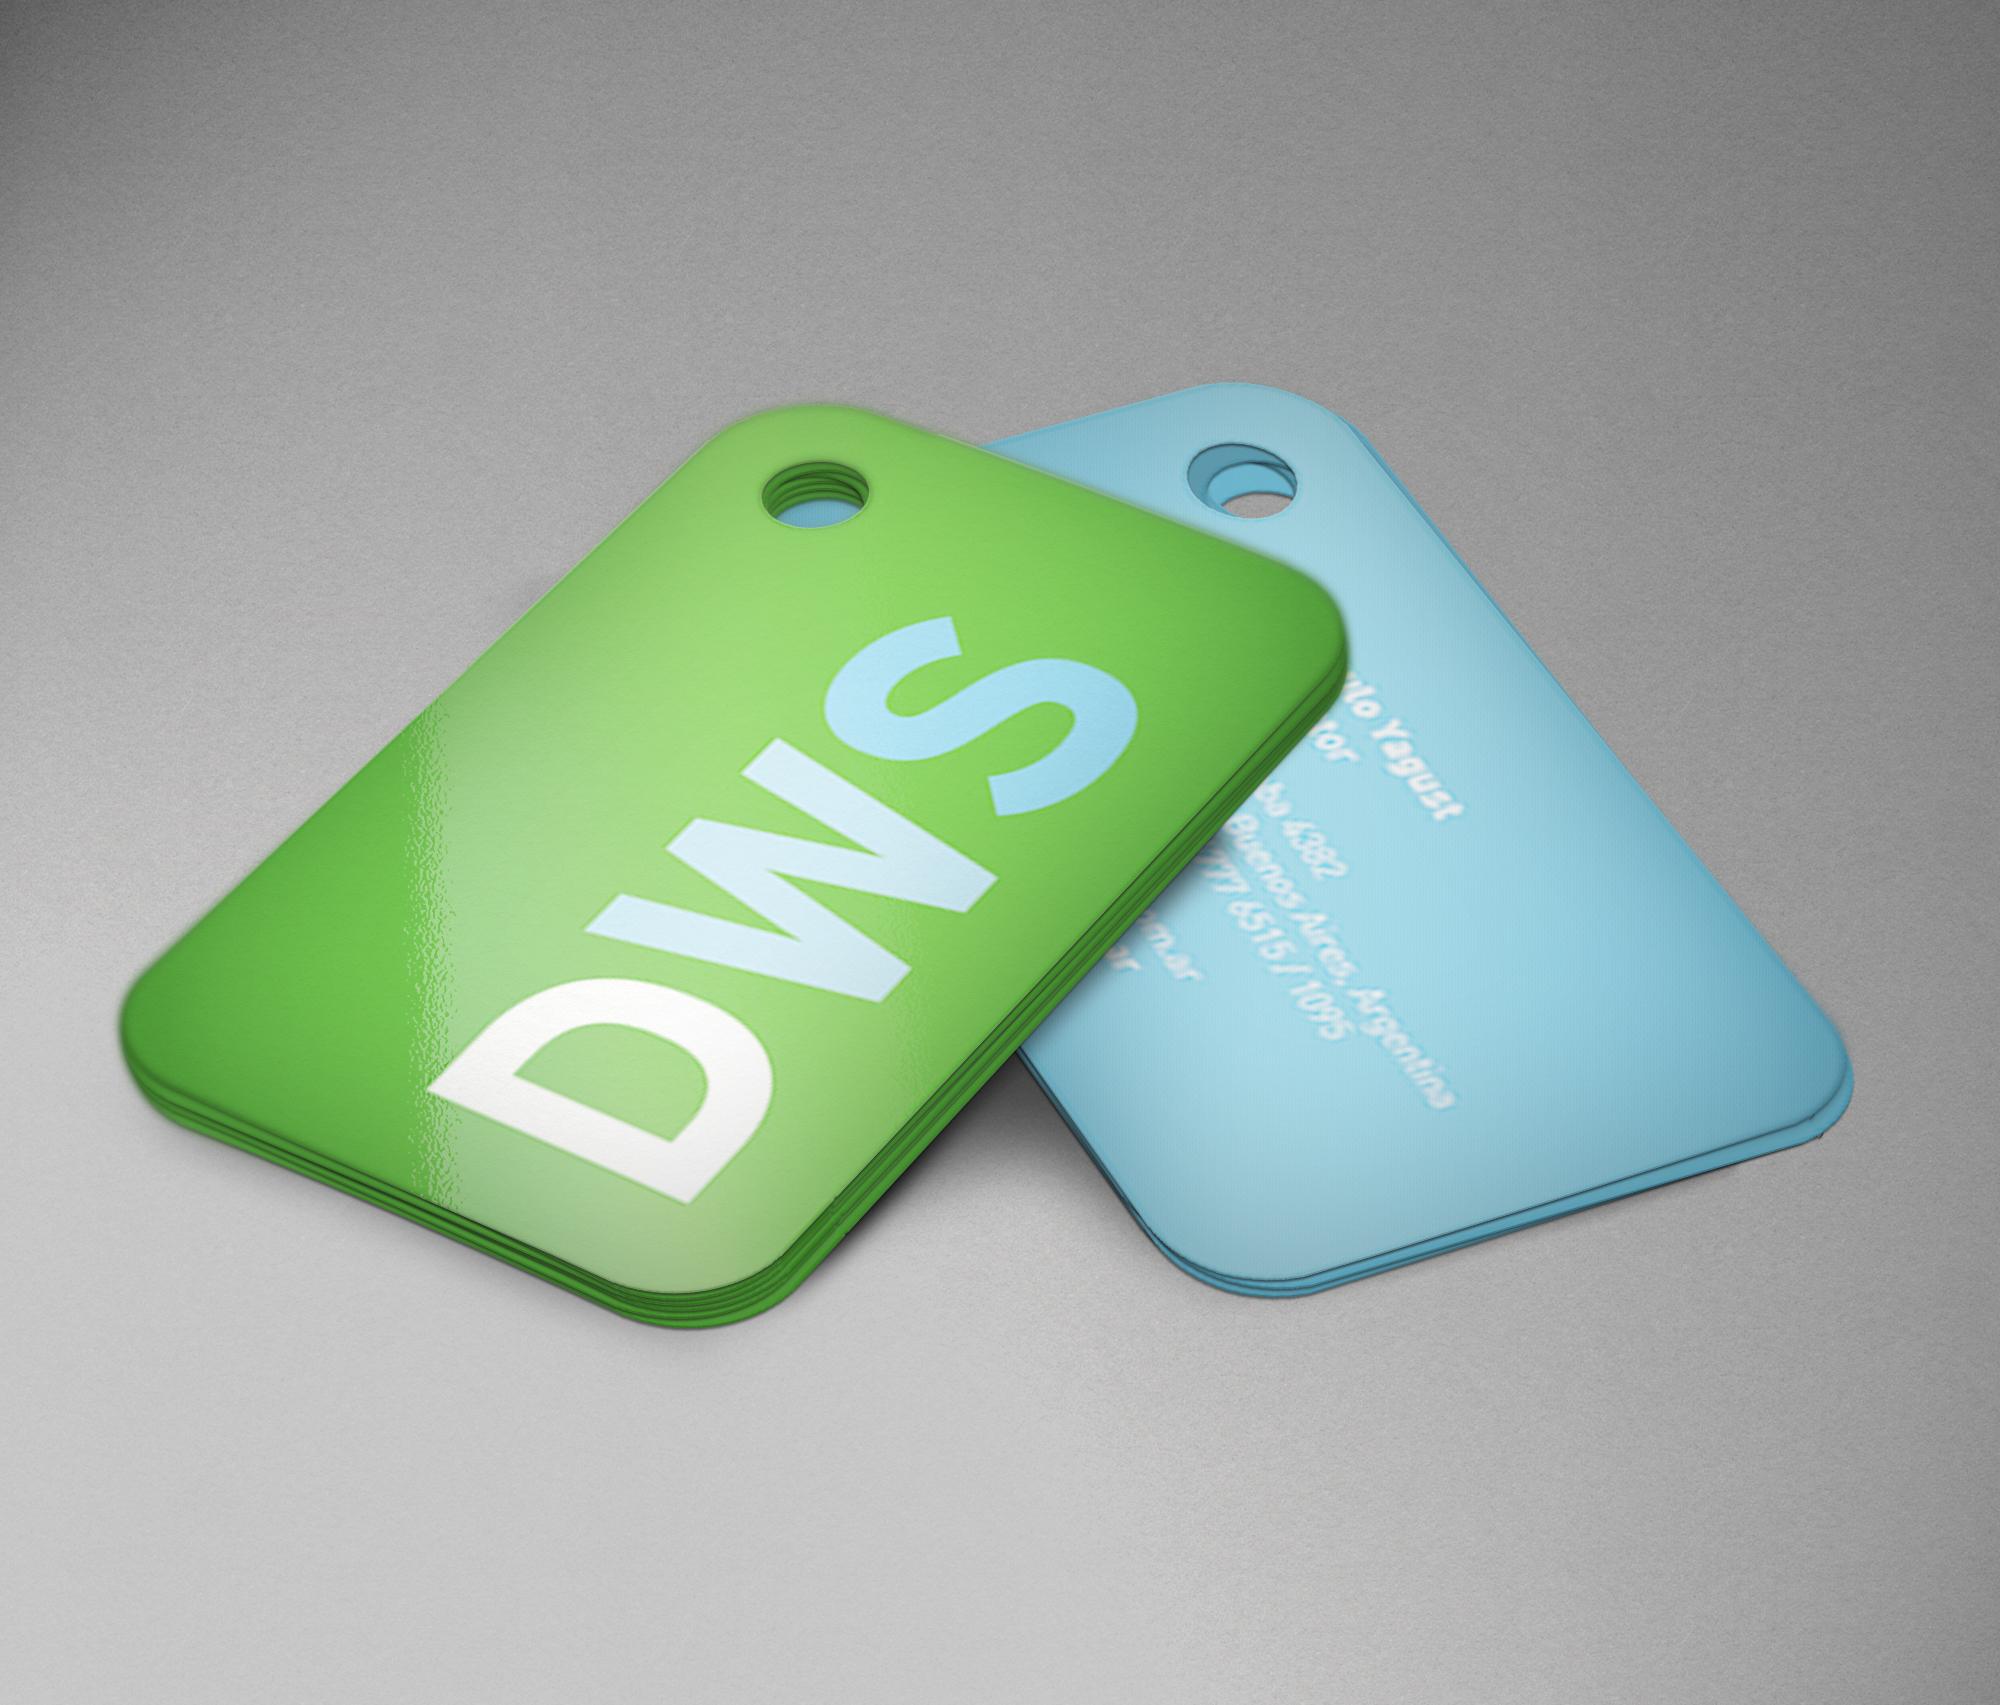 DWS_tarjeta personal_fondo gris